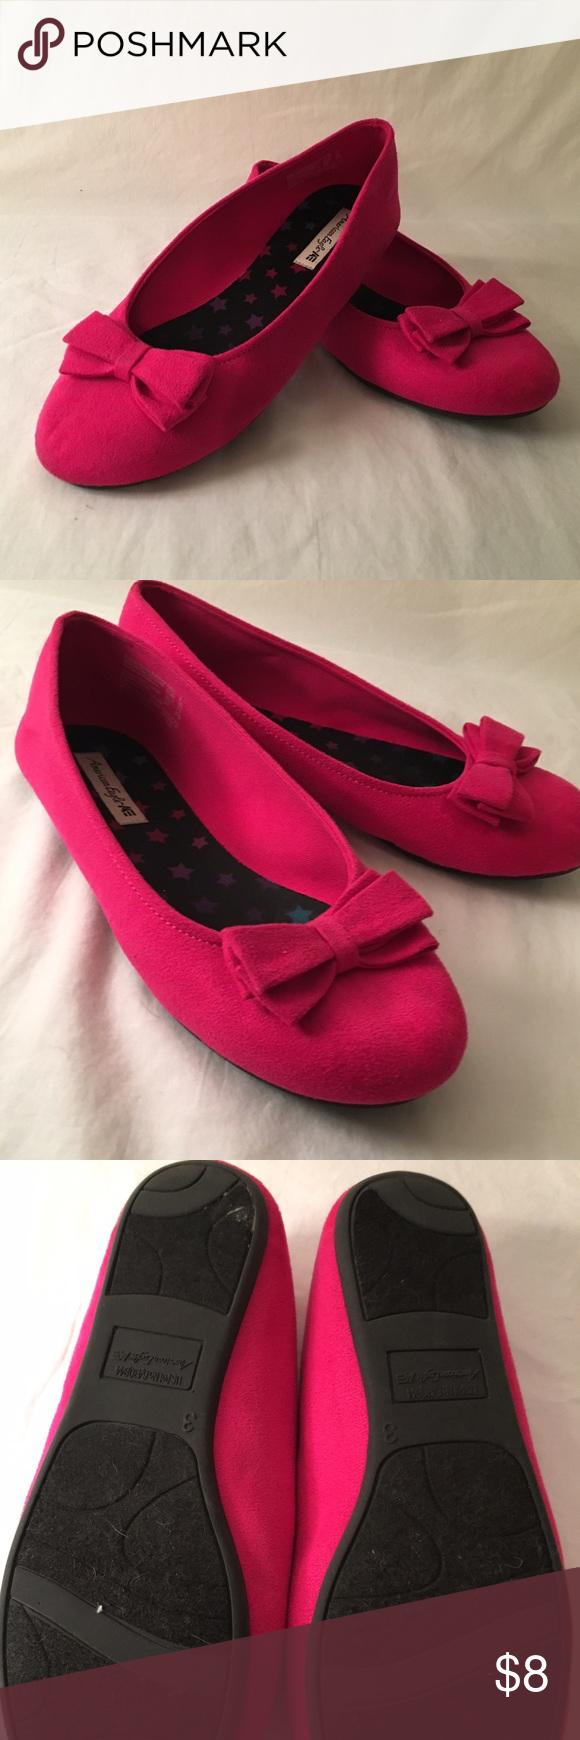 Hot pink dress shoes  American Eagle Pink Ballet Flat girls sz  Like New Girls Hot Pink